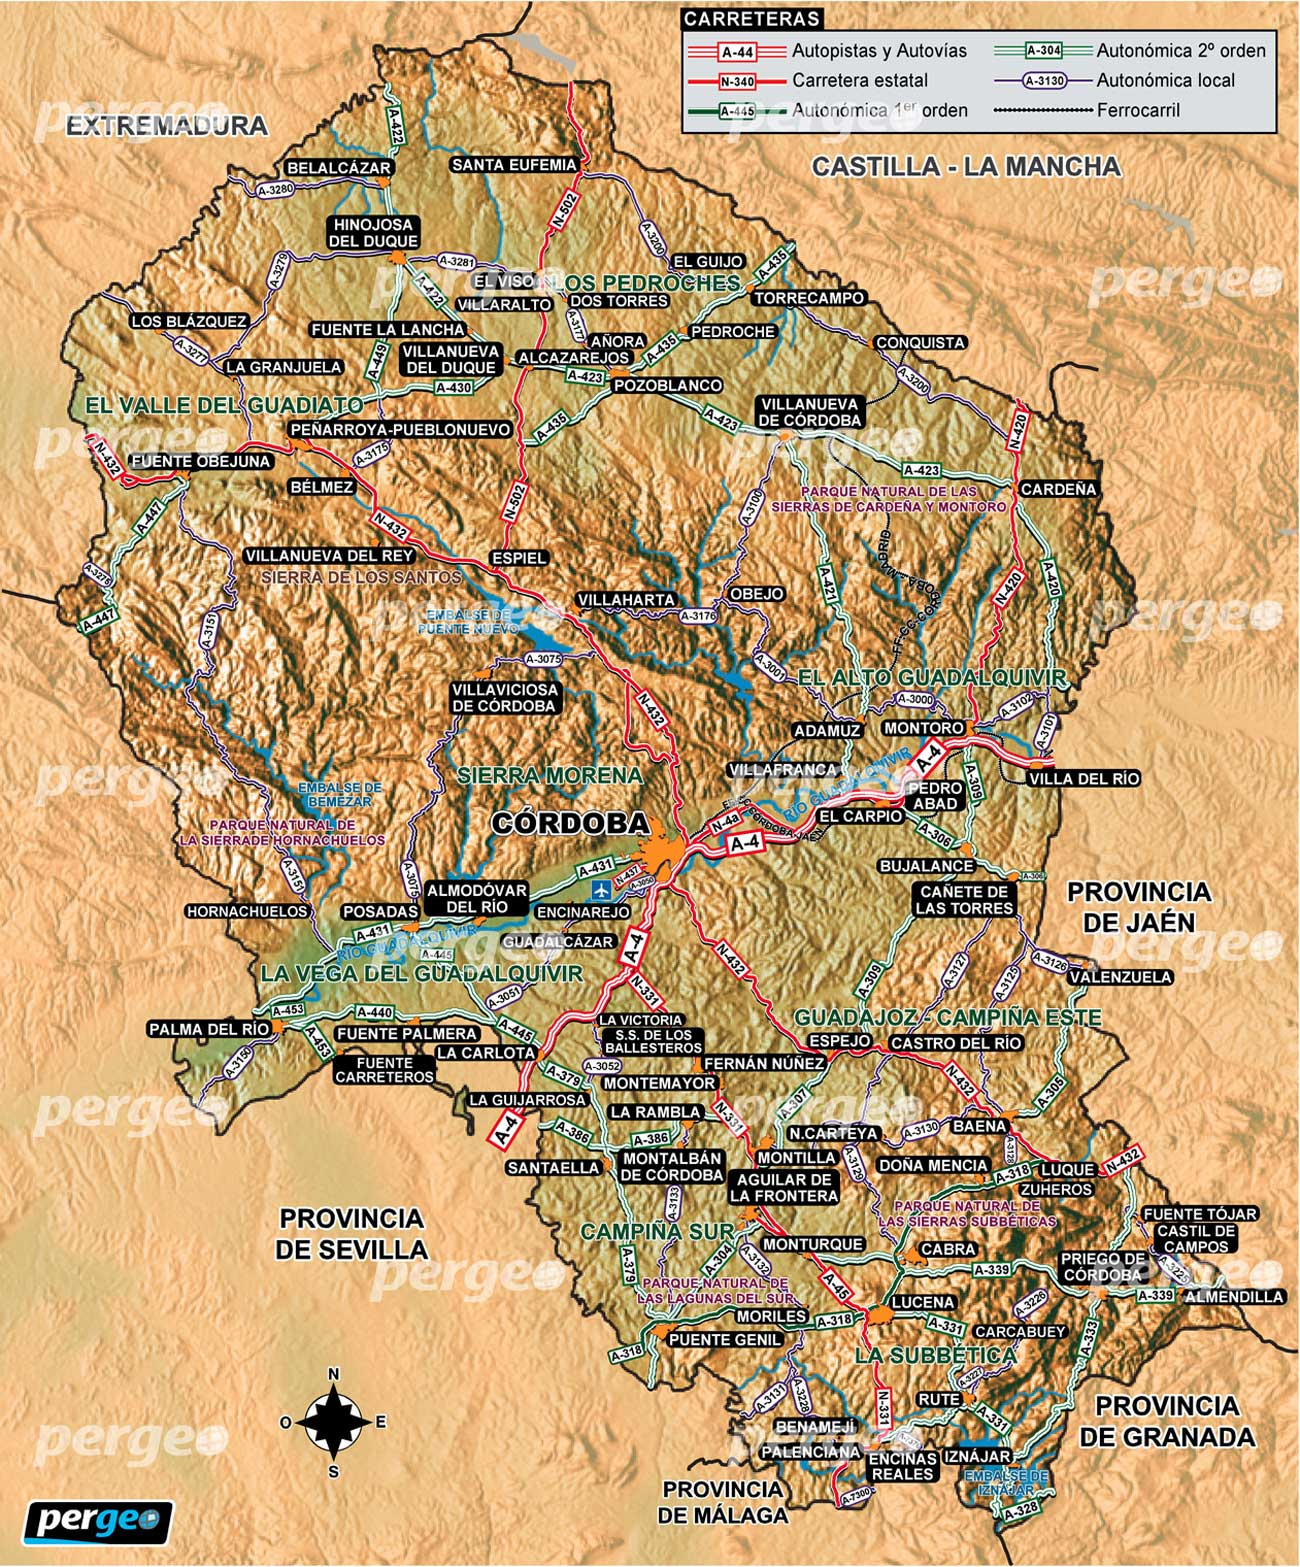 Mapa Provincia De Cordoba España.Provincia De Cordoba Mapa Artistico E Ilustradopergeo Es